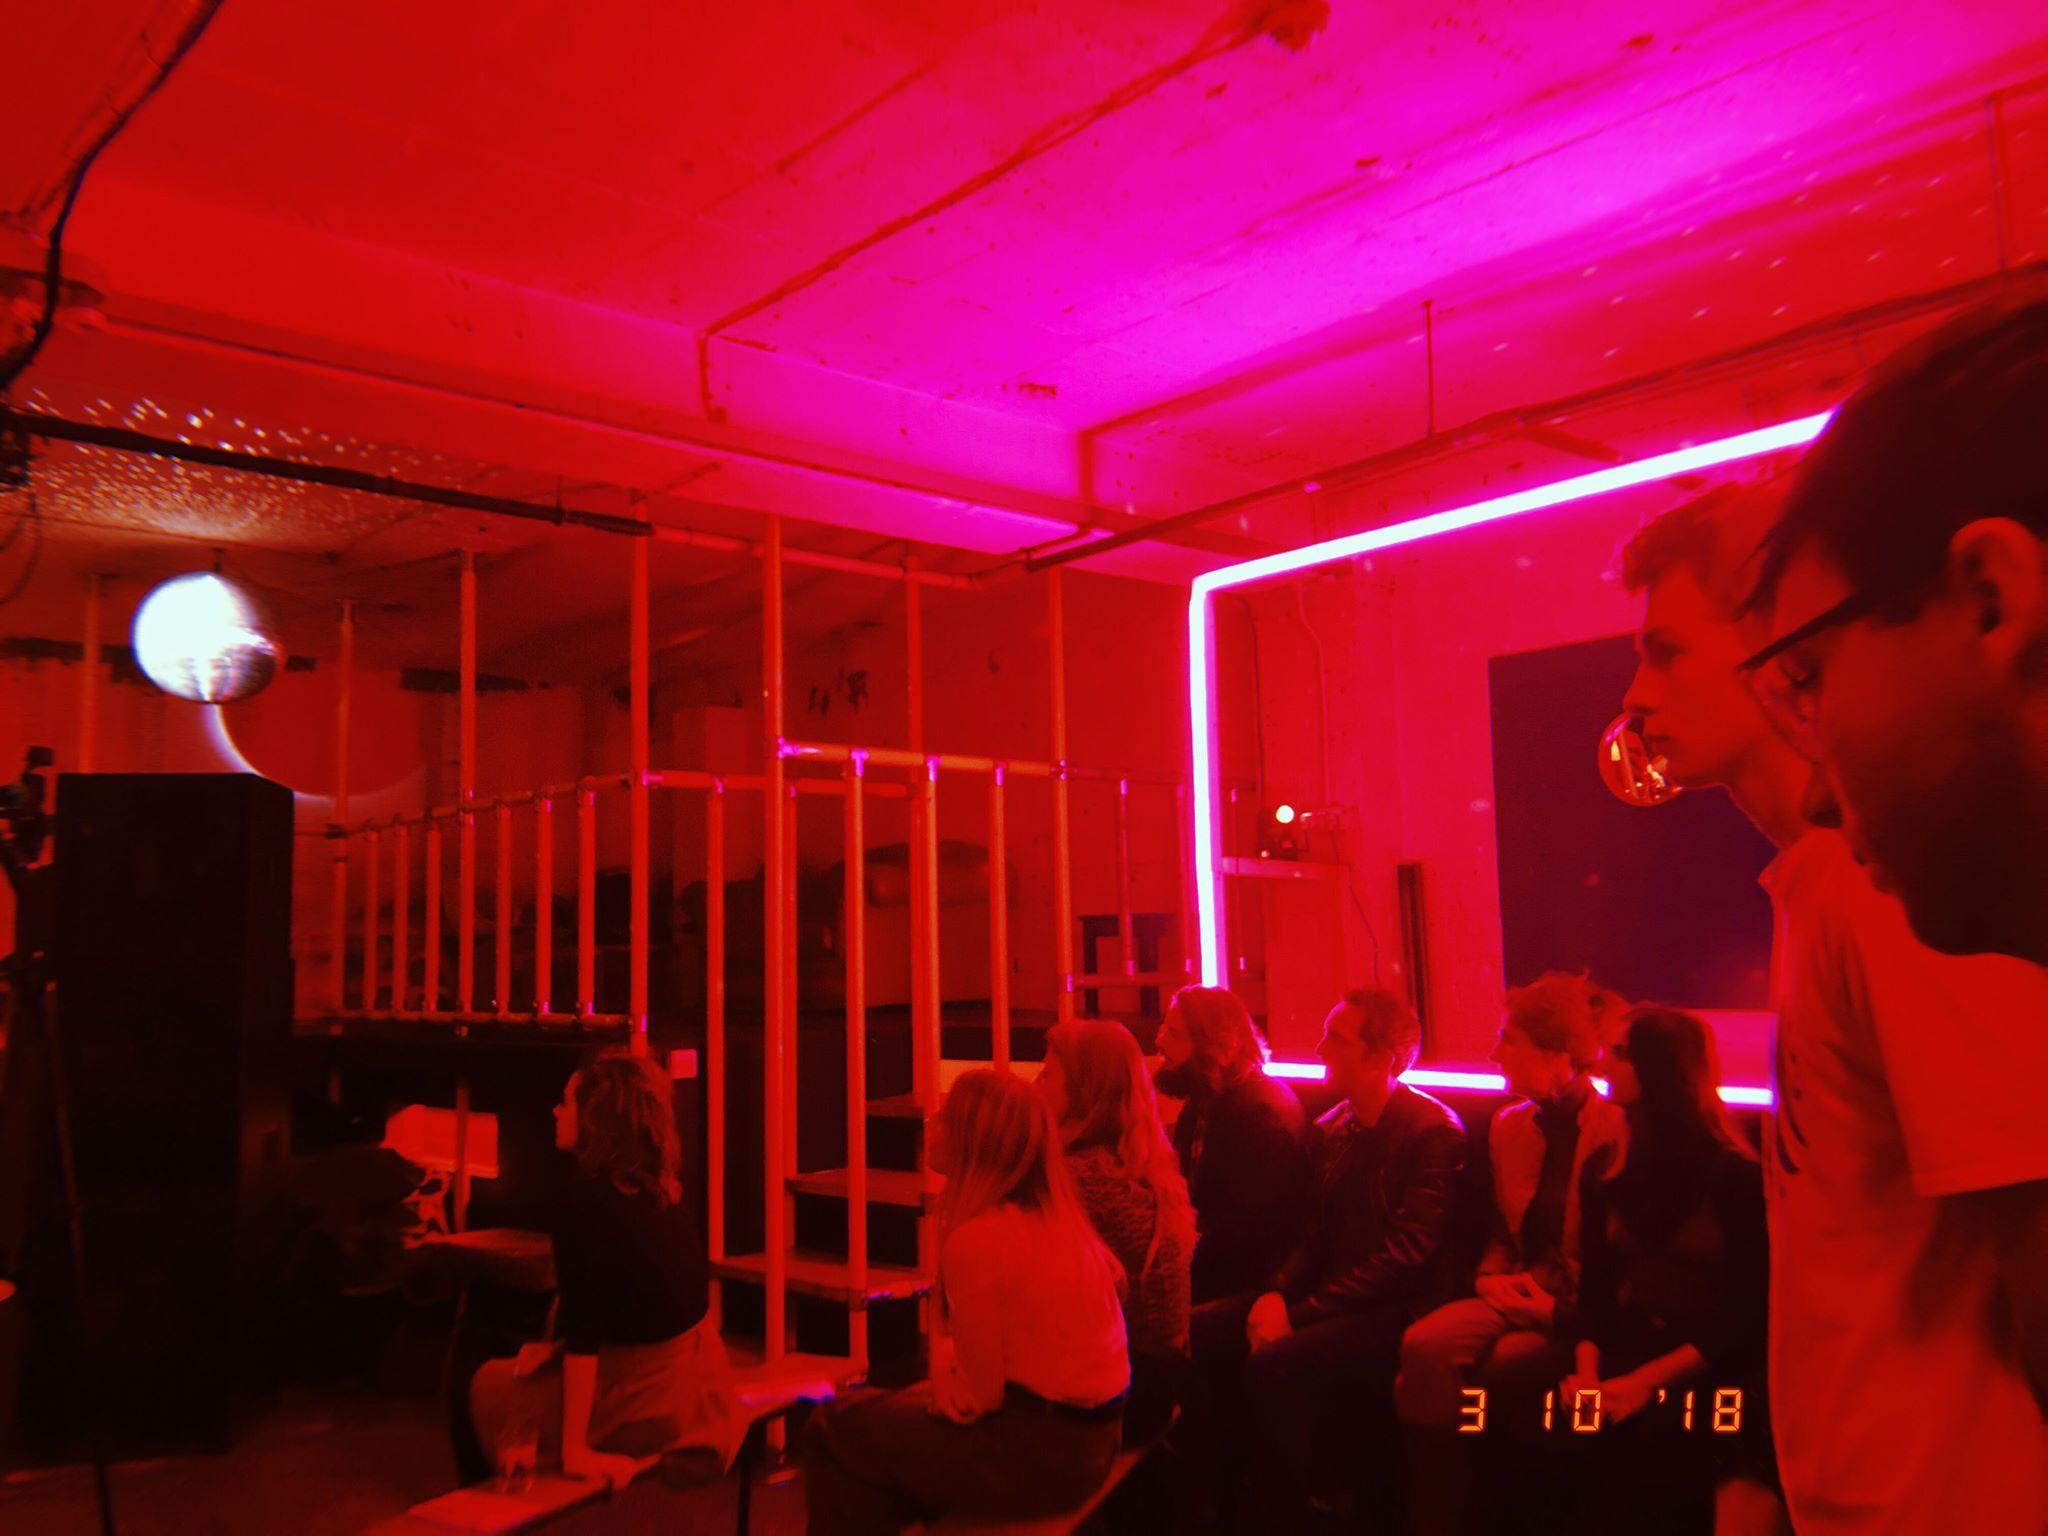 Image may contain: Night Life, Club, Lighting, Light, Human, Person, Interior Design, Indoors